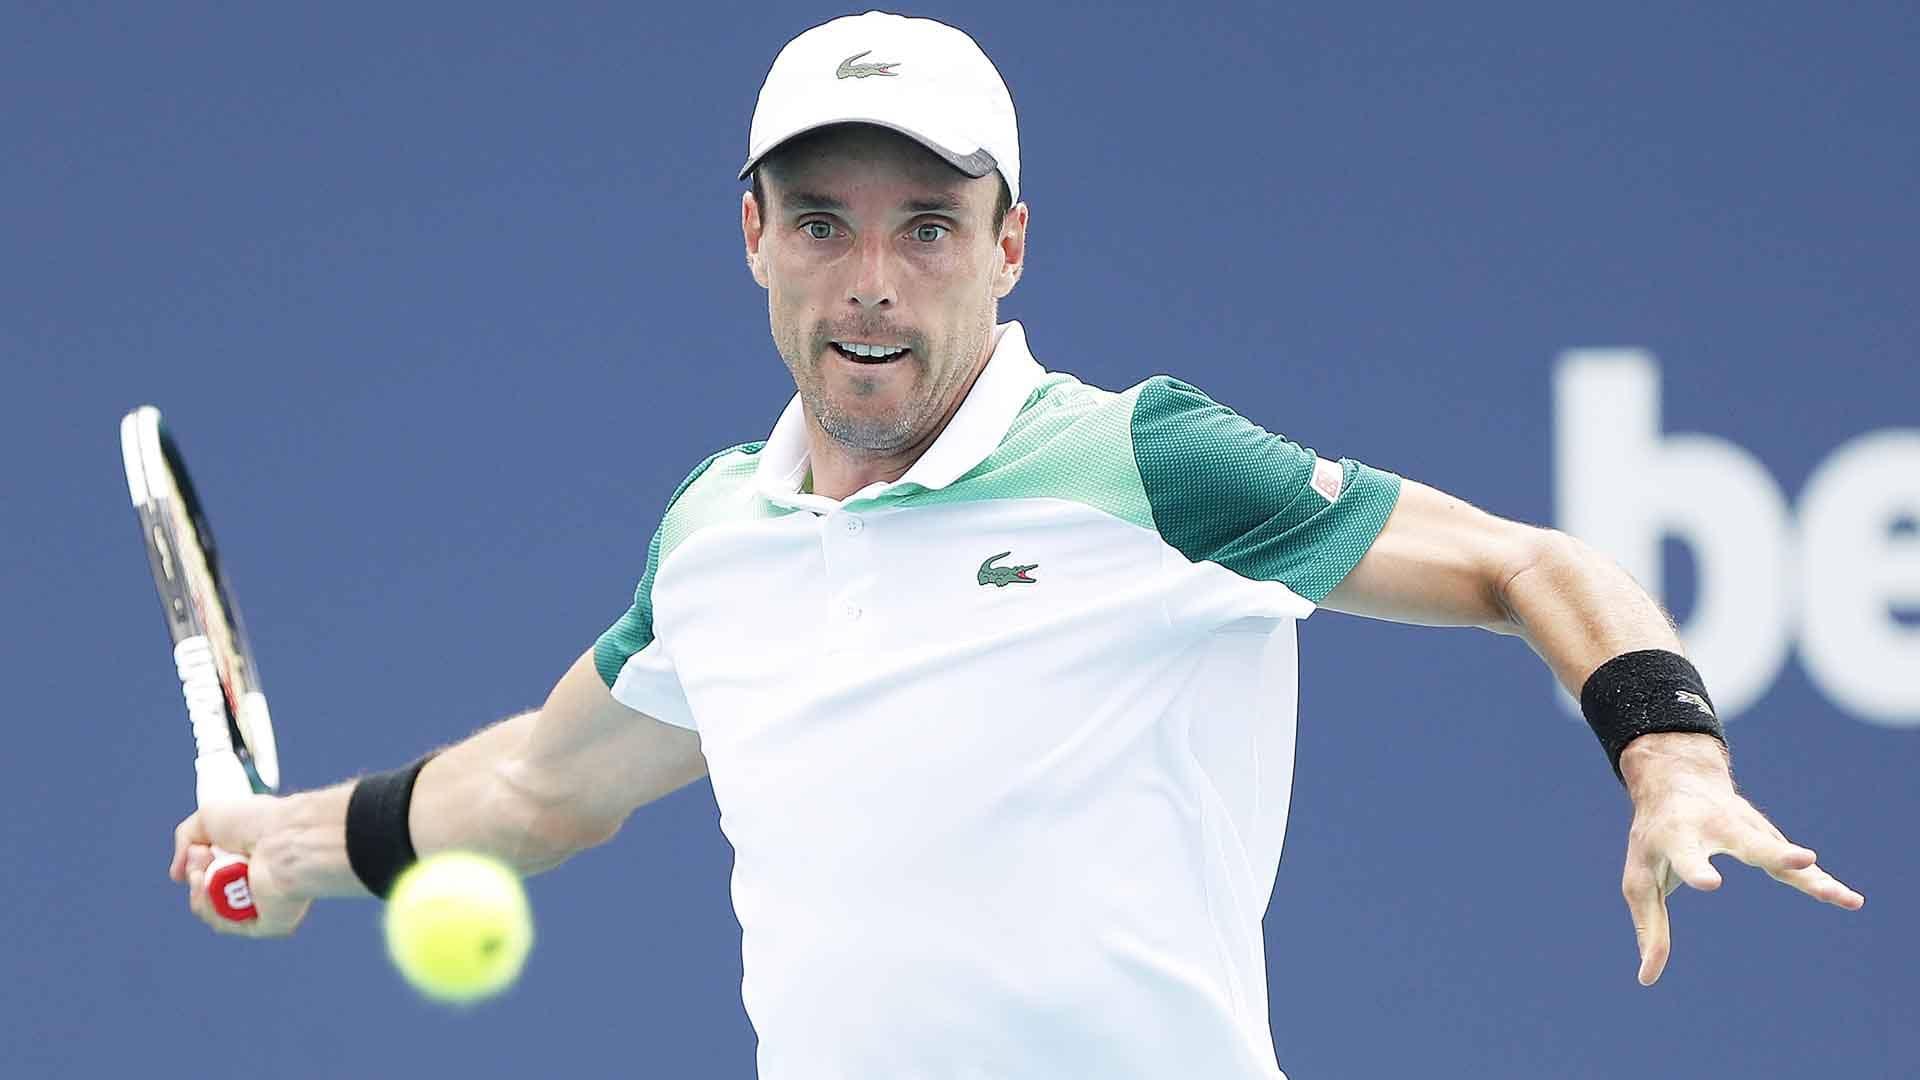 Barcelona Open 2021: Roberto Bautista Agut vs. Pablo Andujar Tennis Pick and Prediction